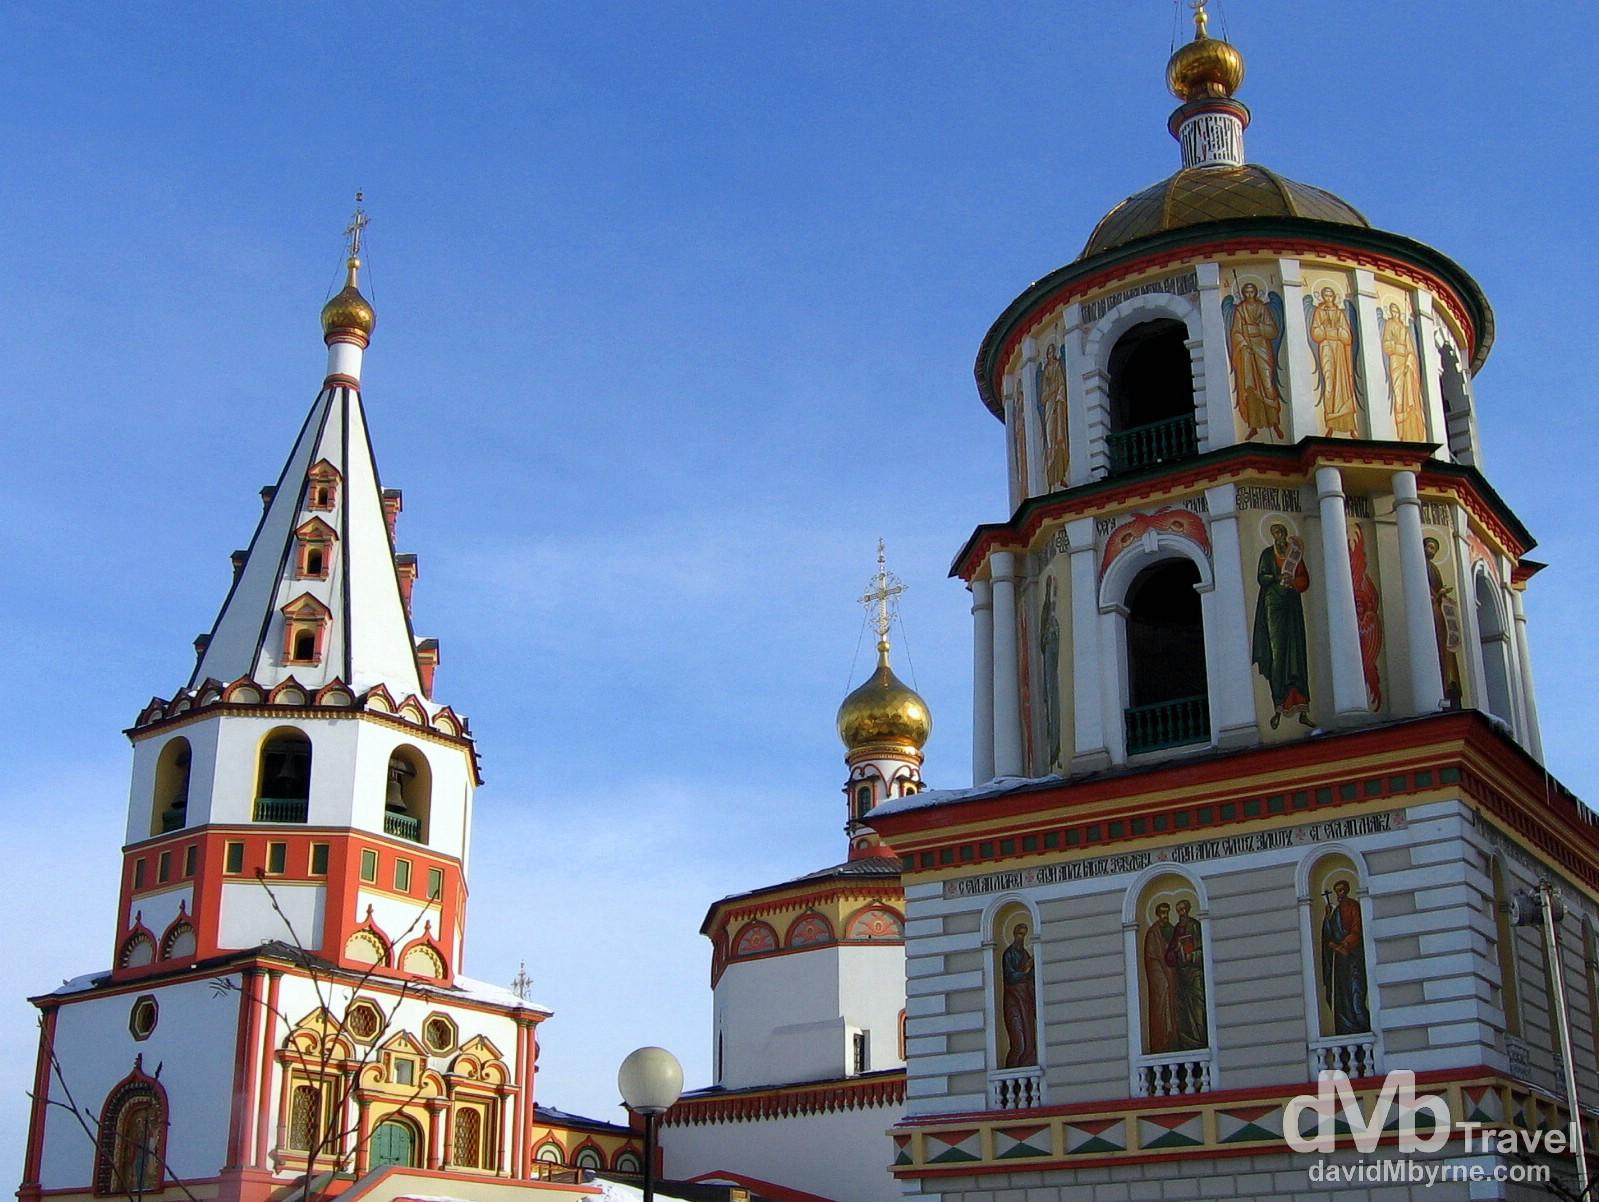 The Bogoyavlensky Cathedral on the banks of the Aangara River in Irkutsk, Siberian Russia. February 18, 2006.